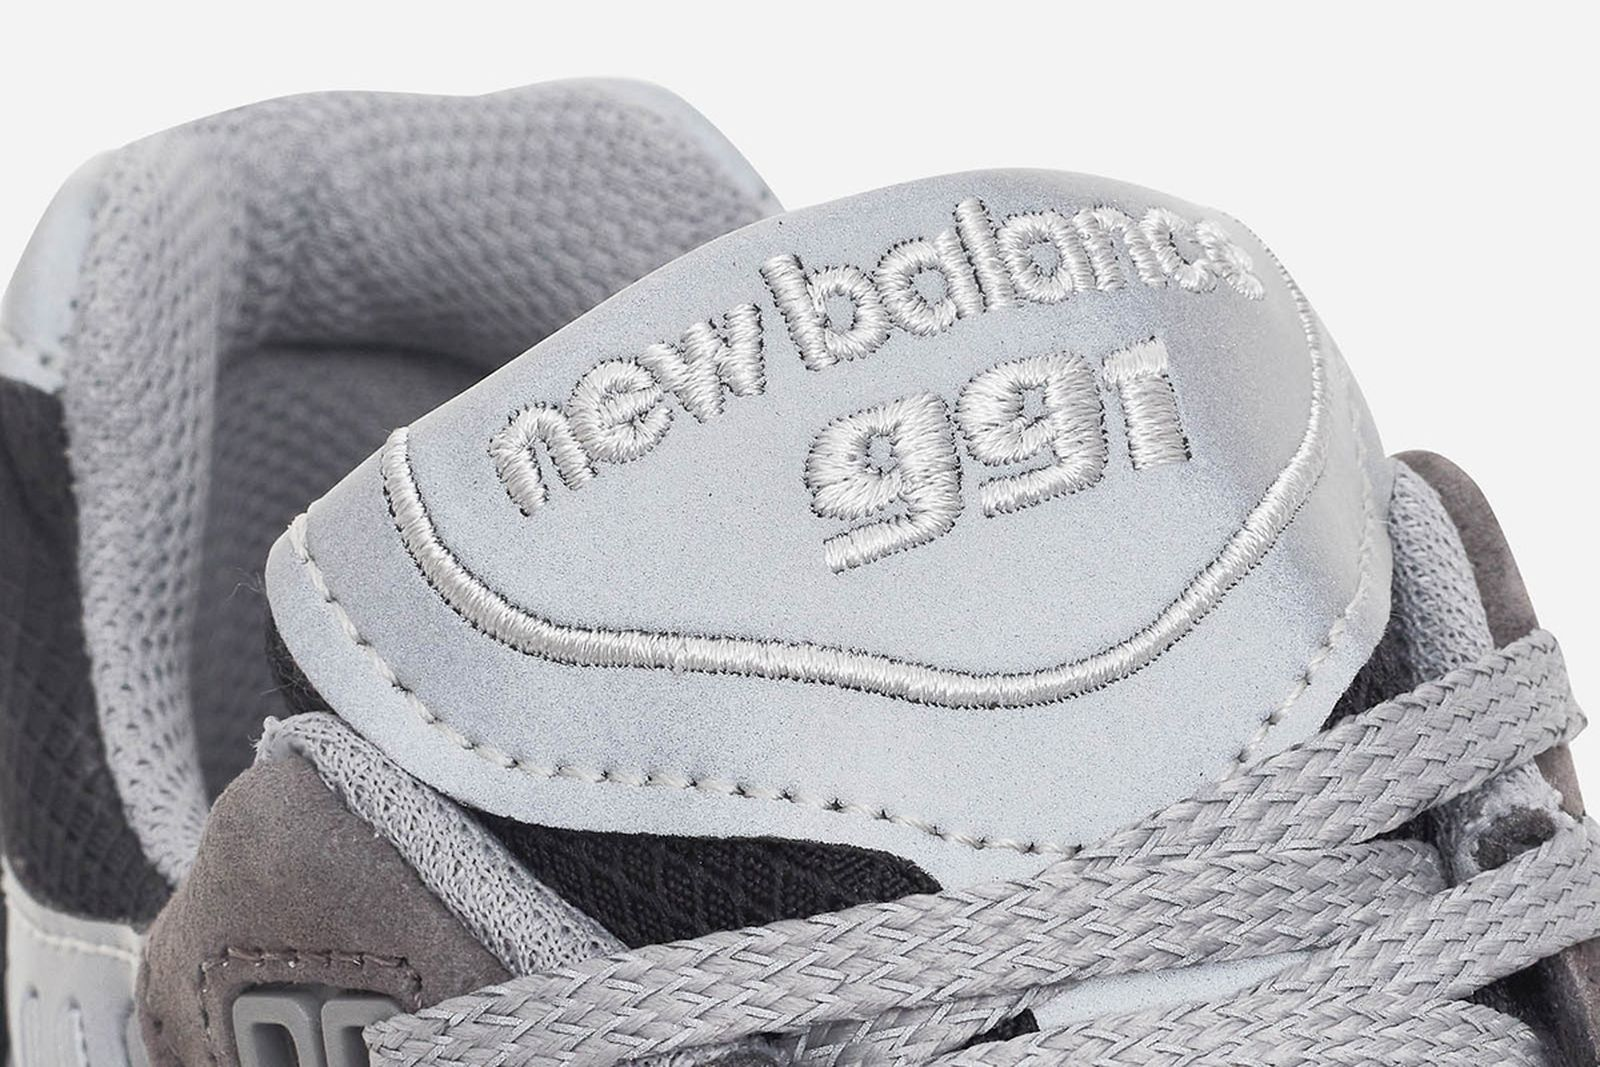 slam-jam-new-balance-991-release-date-price-05